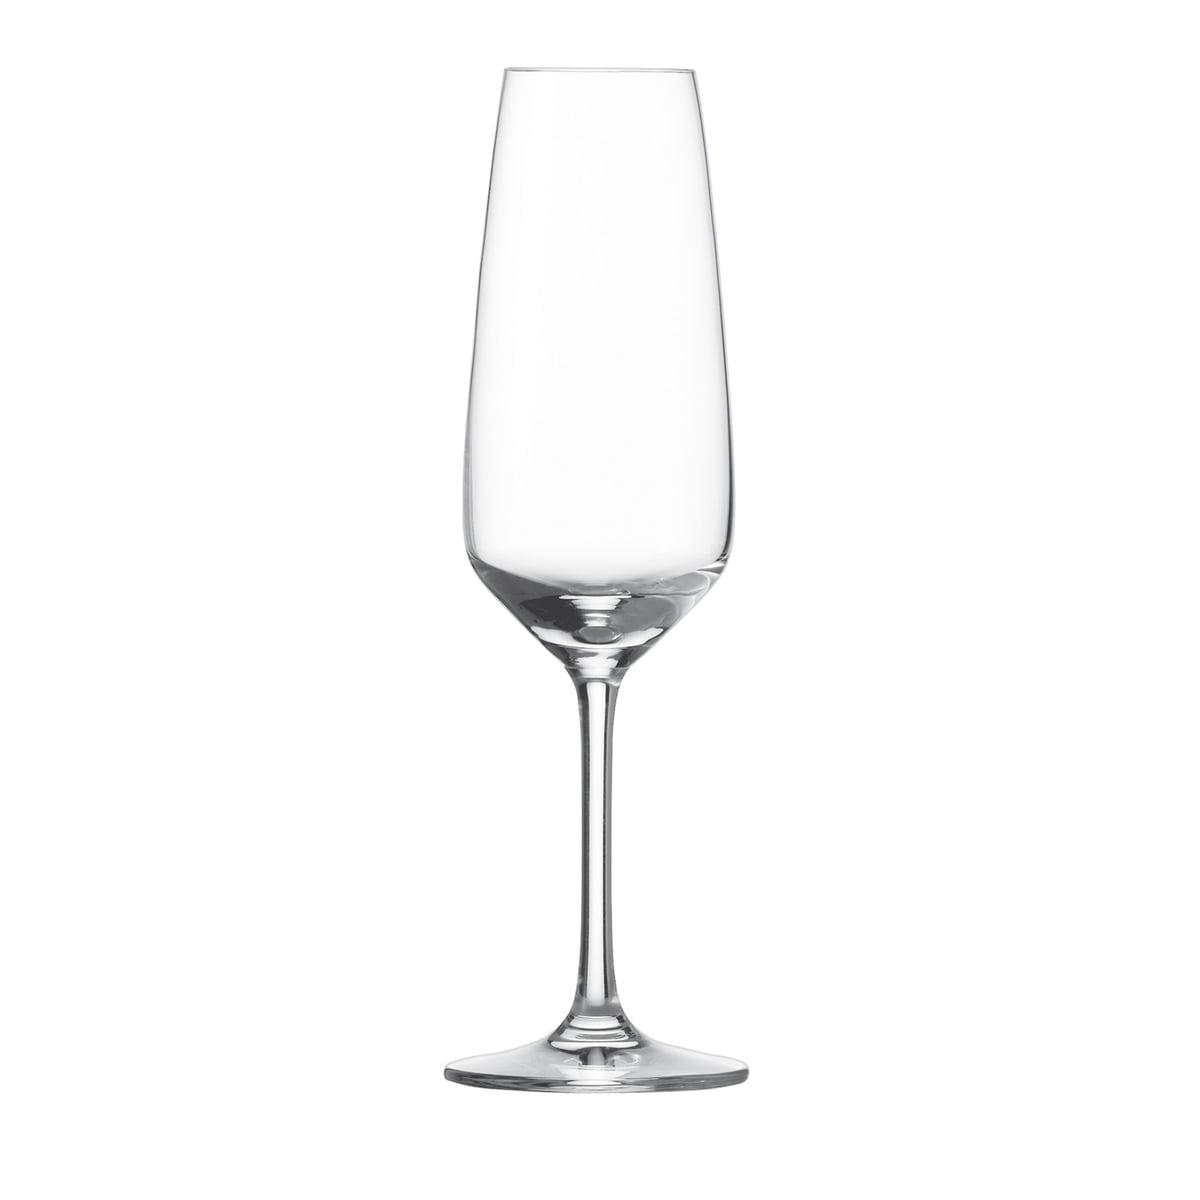 taste champagne glass by schott zwiesel. Black Bedroom Furniture Sets. Home Design Ideas